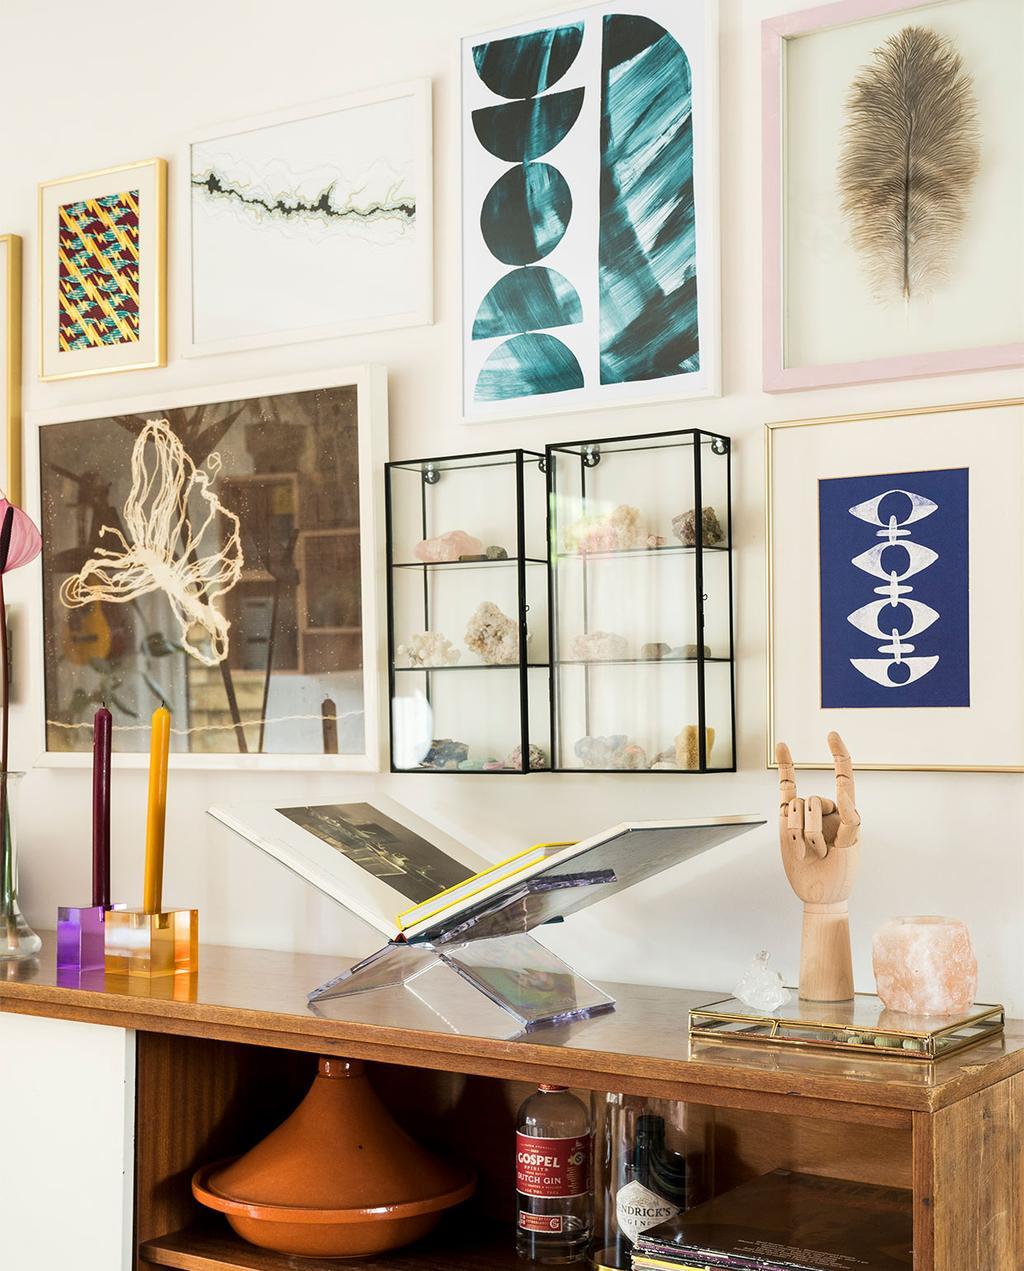 vtwonen 07-2021 | verschillende kunstwerken boven de kast | maximalisme | wall art